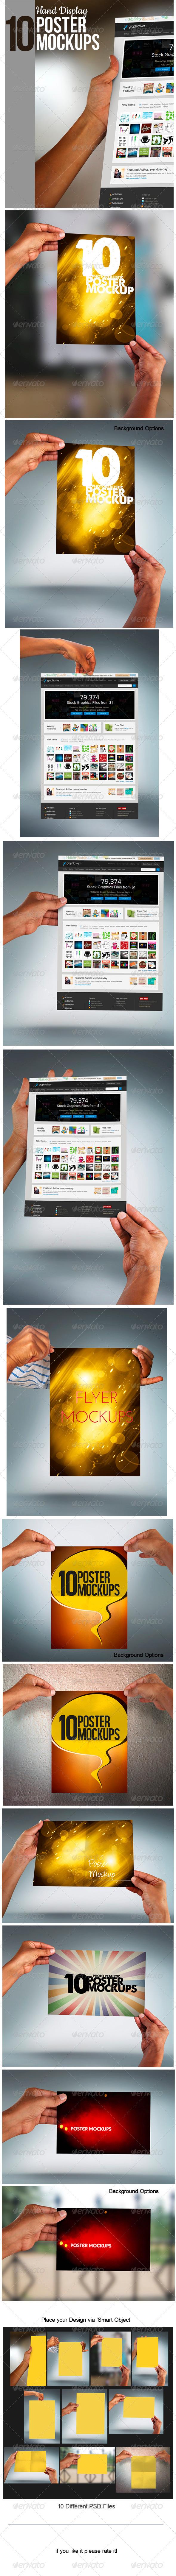 Hand Display Poster Mockup - Posters Print